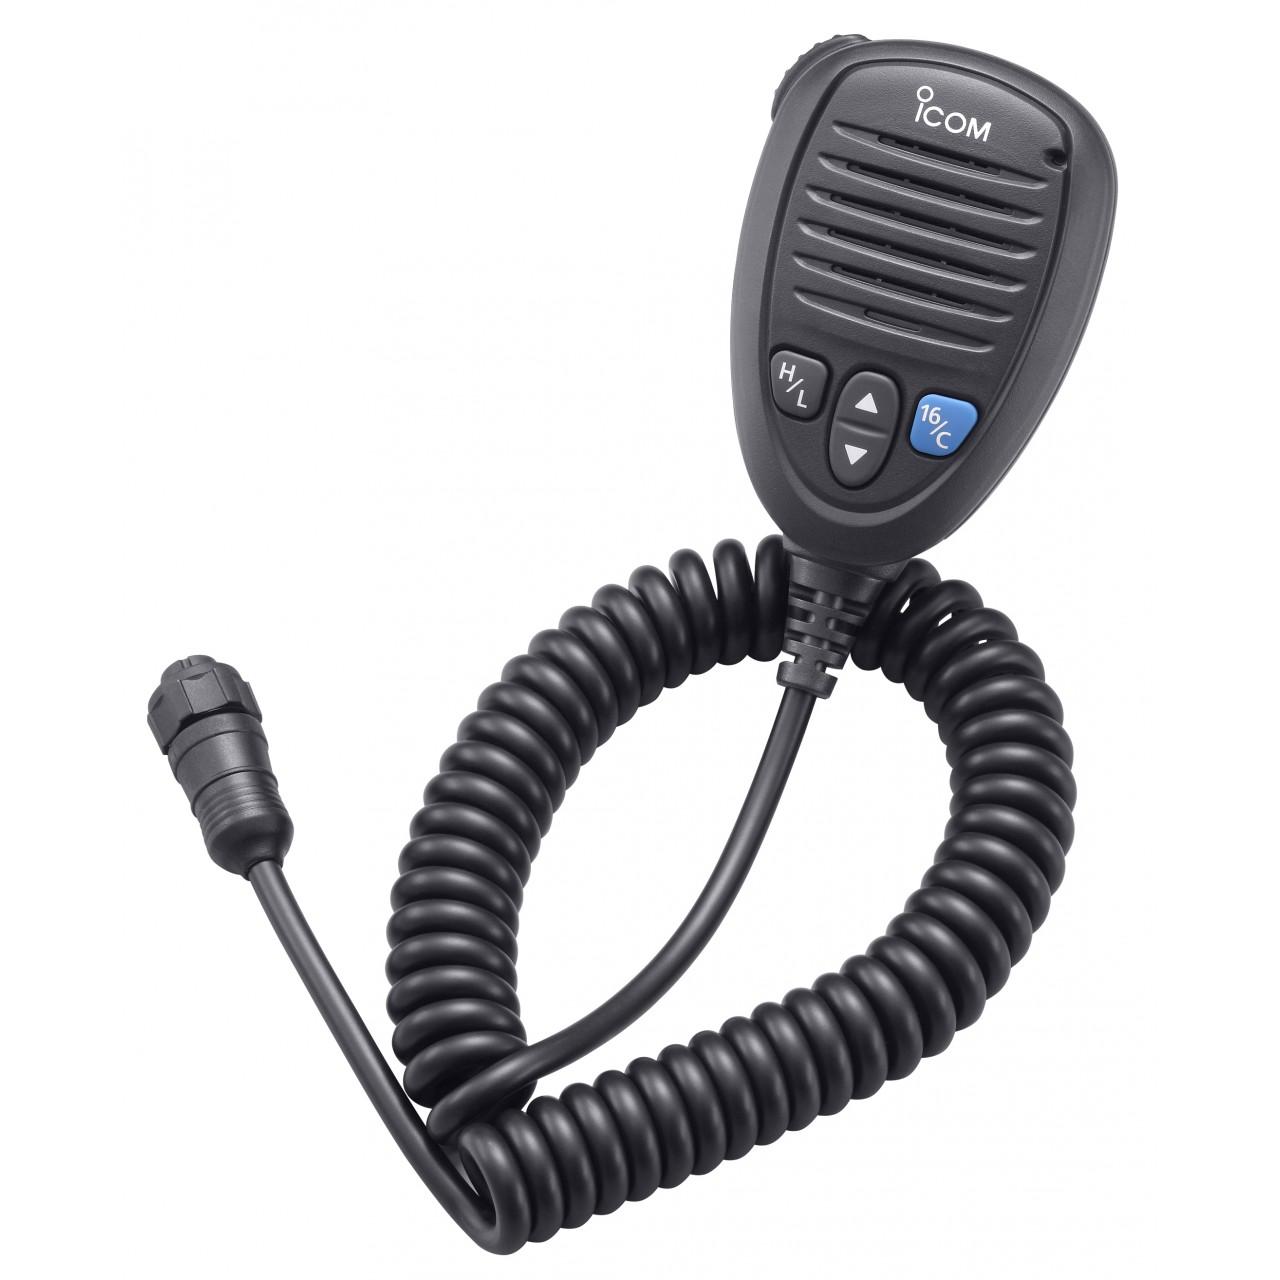 HM-205RB Microphones - ICOM